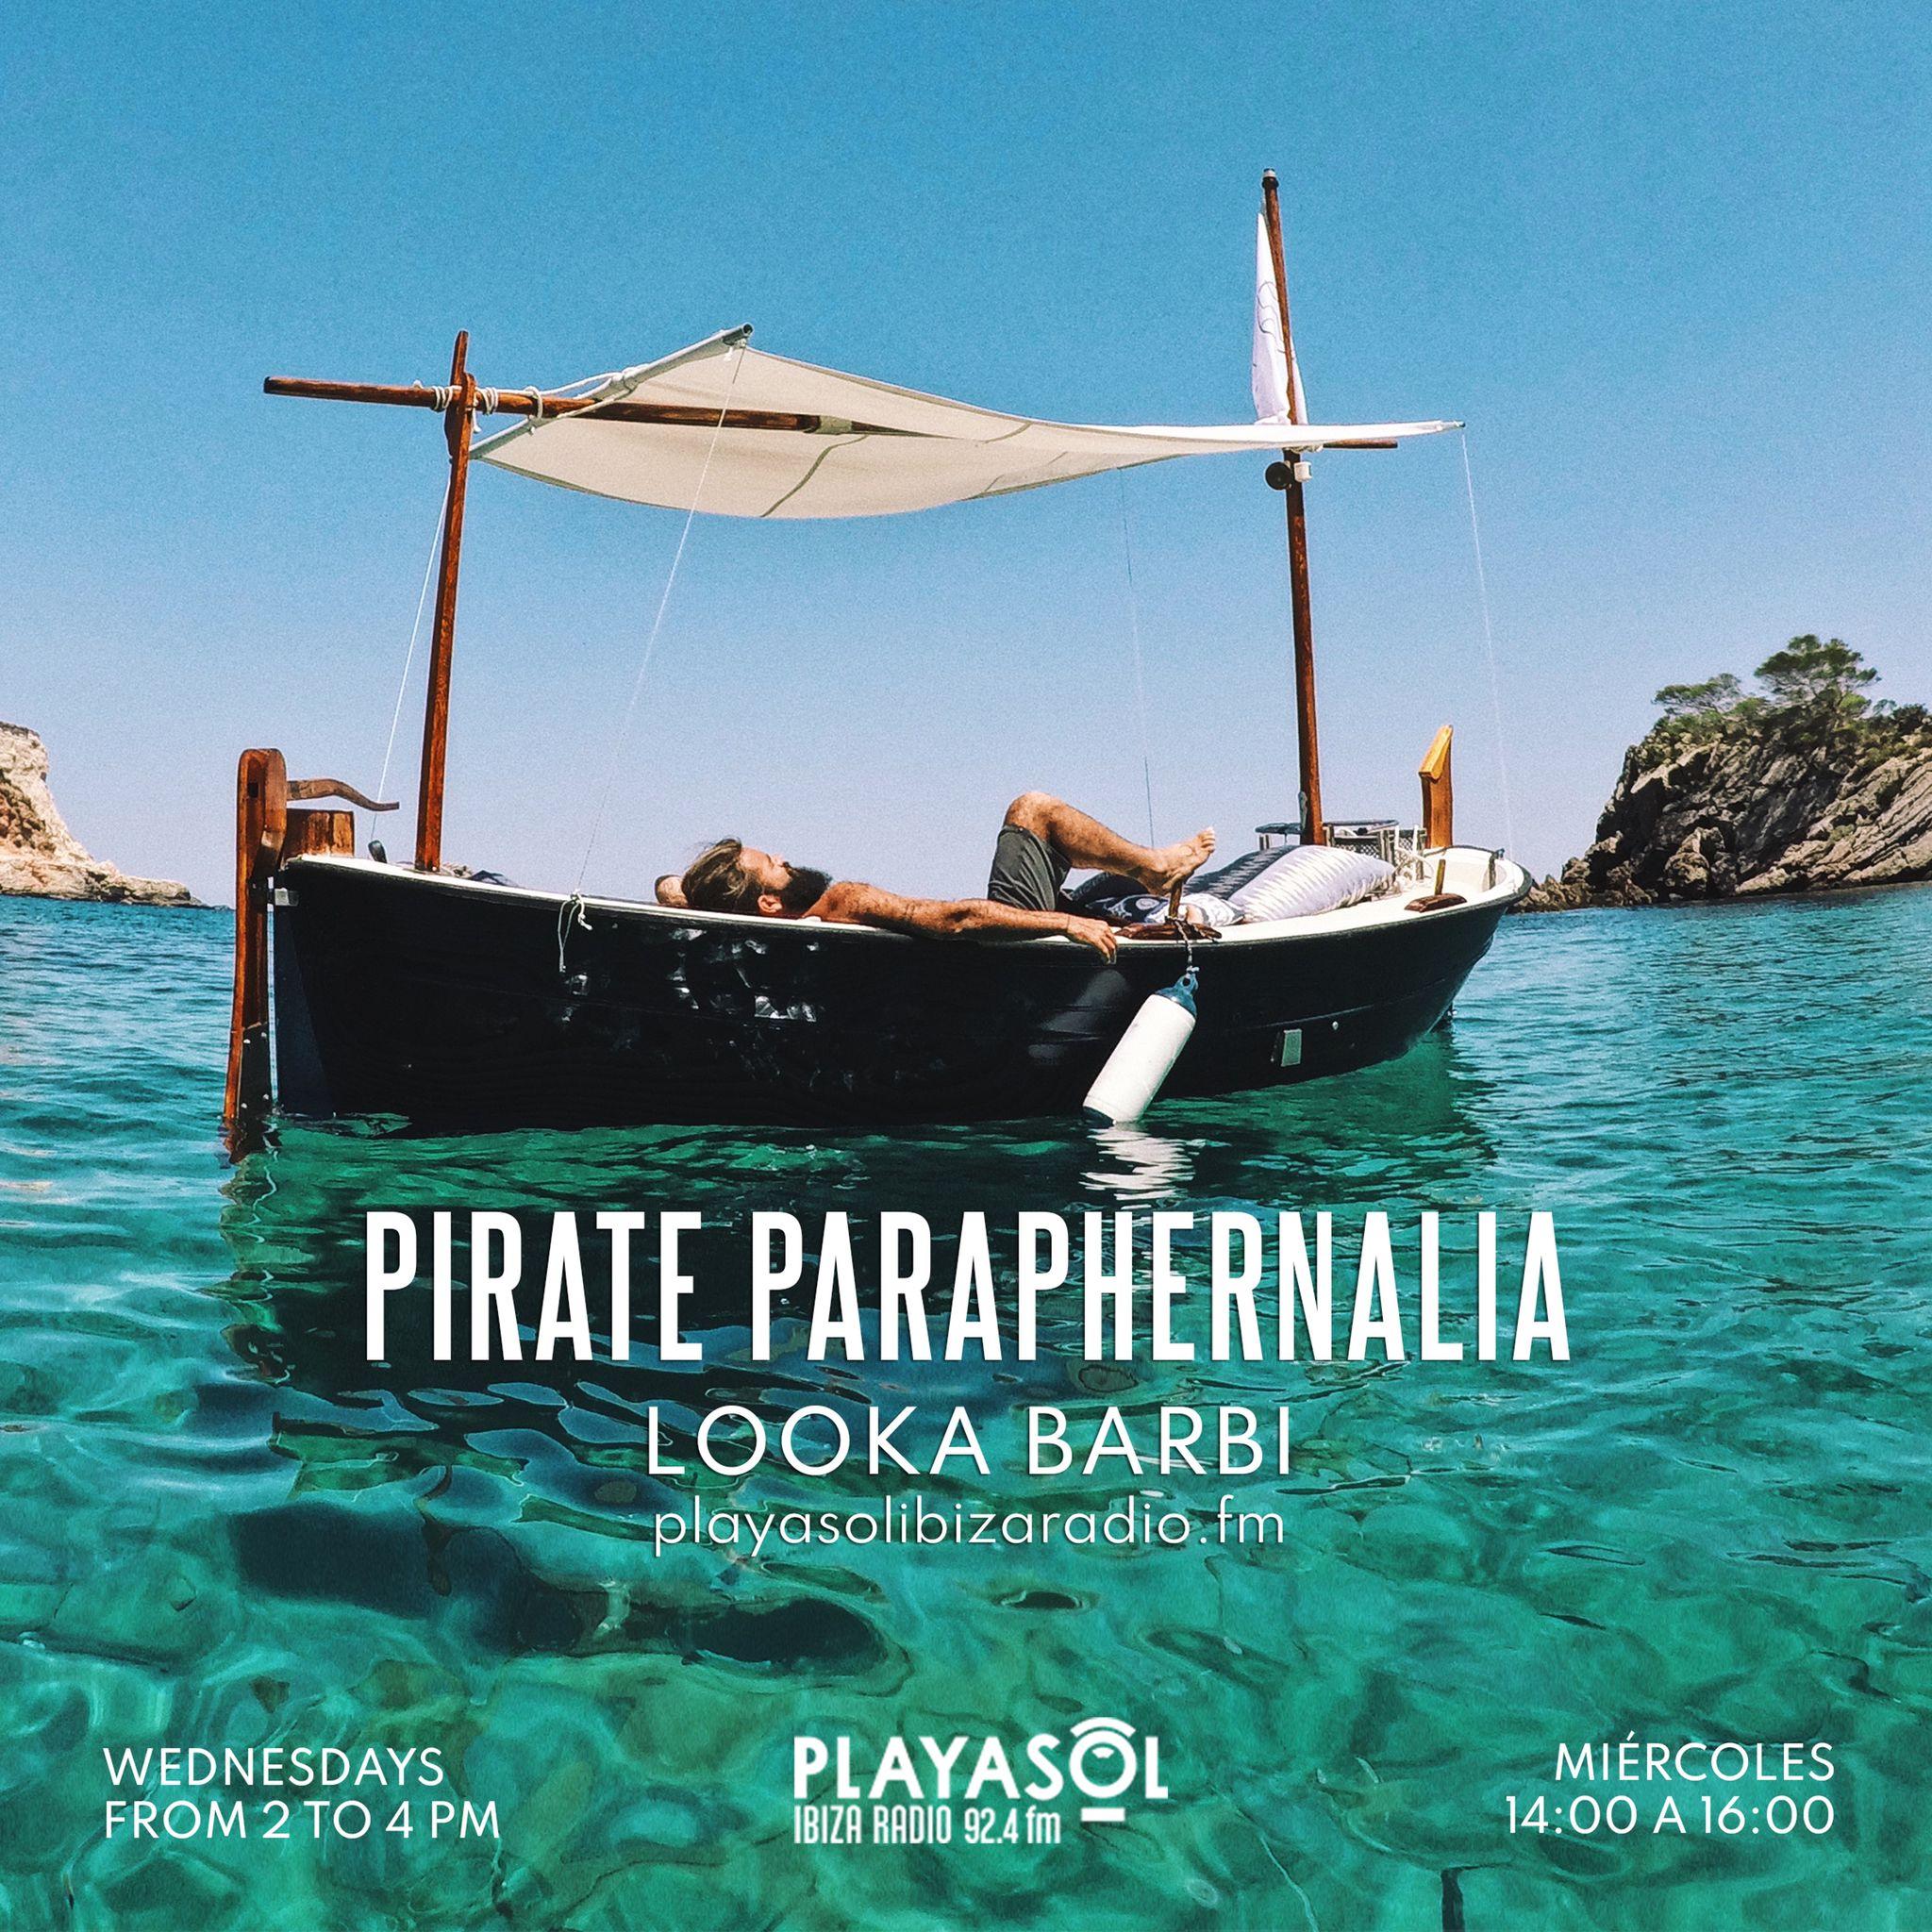 Pirate Paraphernalia by Looka barbi at Playasol radio